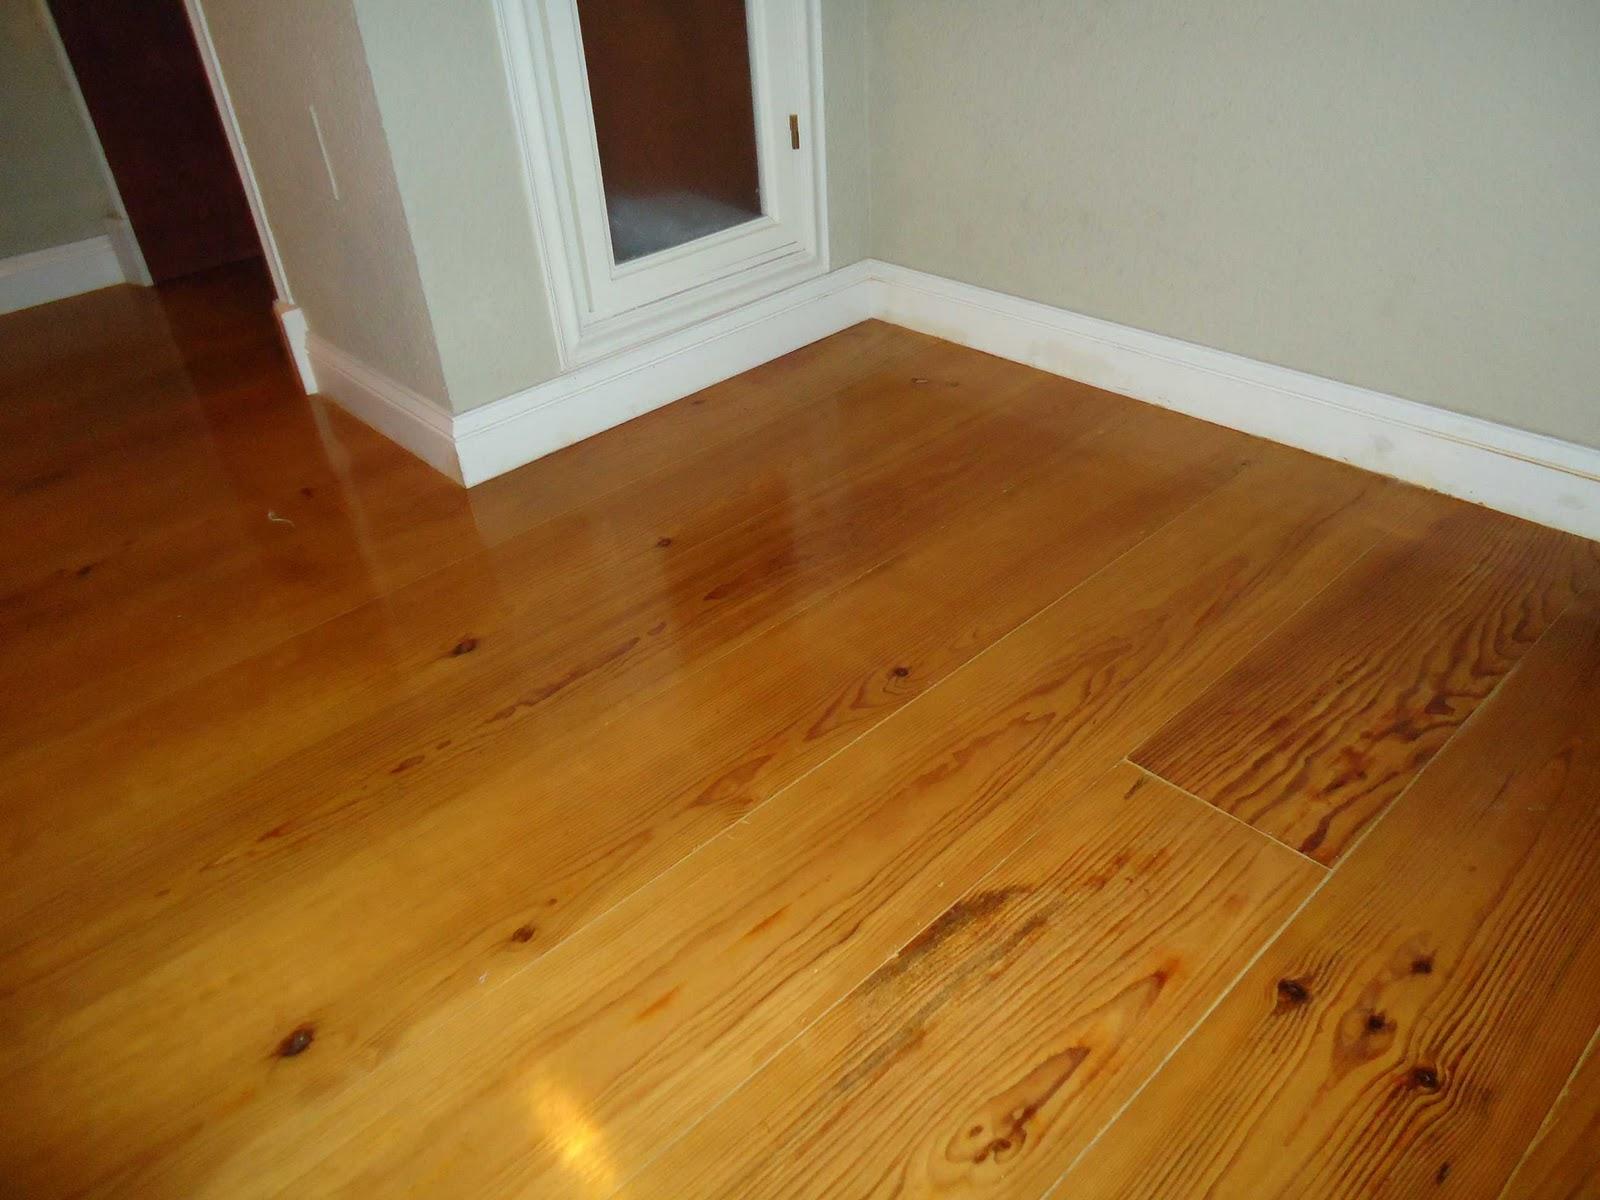 Como instalar un rodapi para un suelo de parquet - Como poner un suelo de madera ...